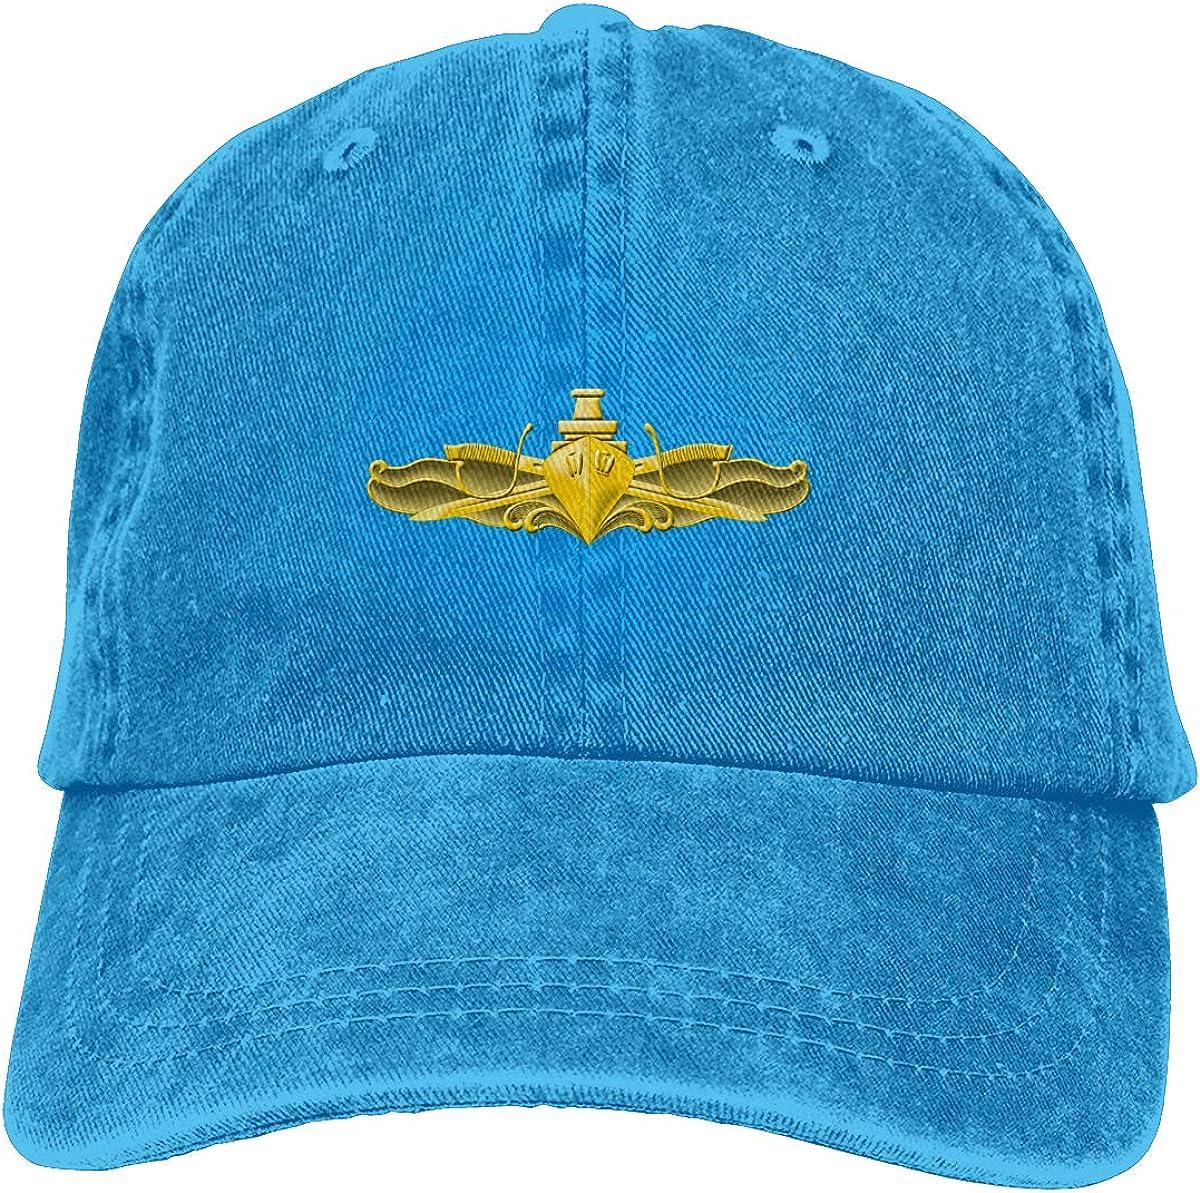 Unisex US Navy Surface Warfare Officer Vintage Washed Distressed Cotton Baseball Cap Adjustable Denim Dad Hat